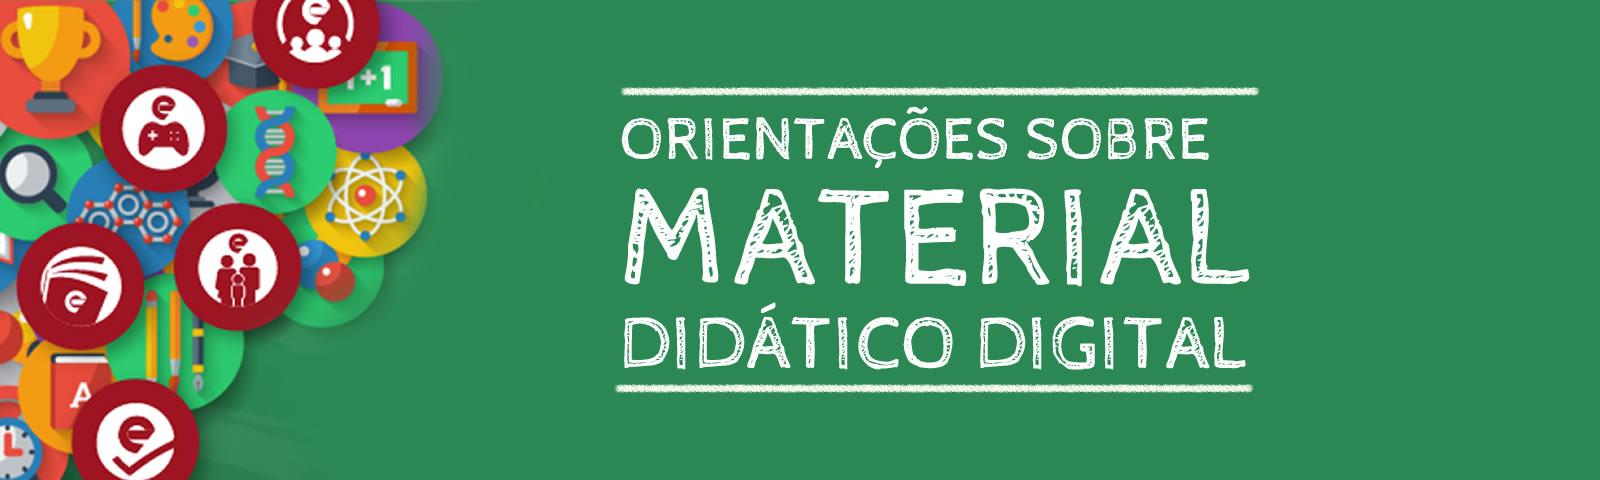 images/2018/05/94-fullhd-orientacoes-para-uso-da-internet-e-material-didatico-digital.jpg